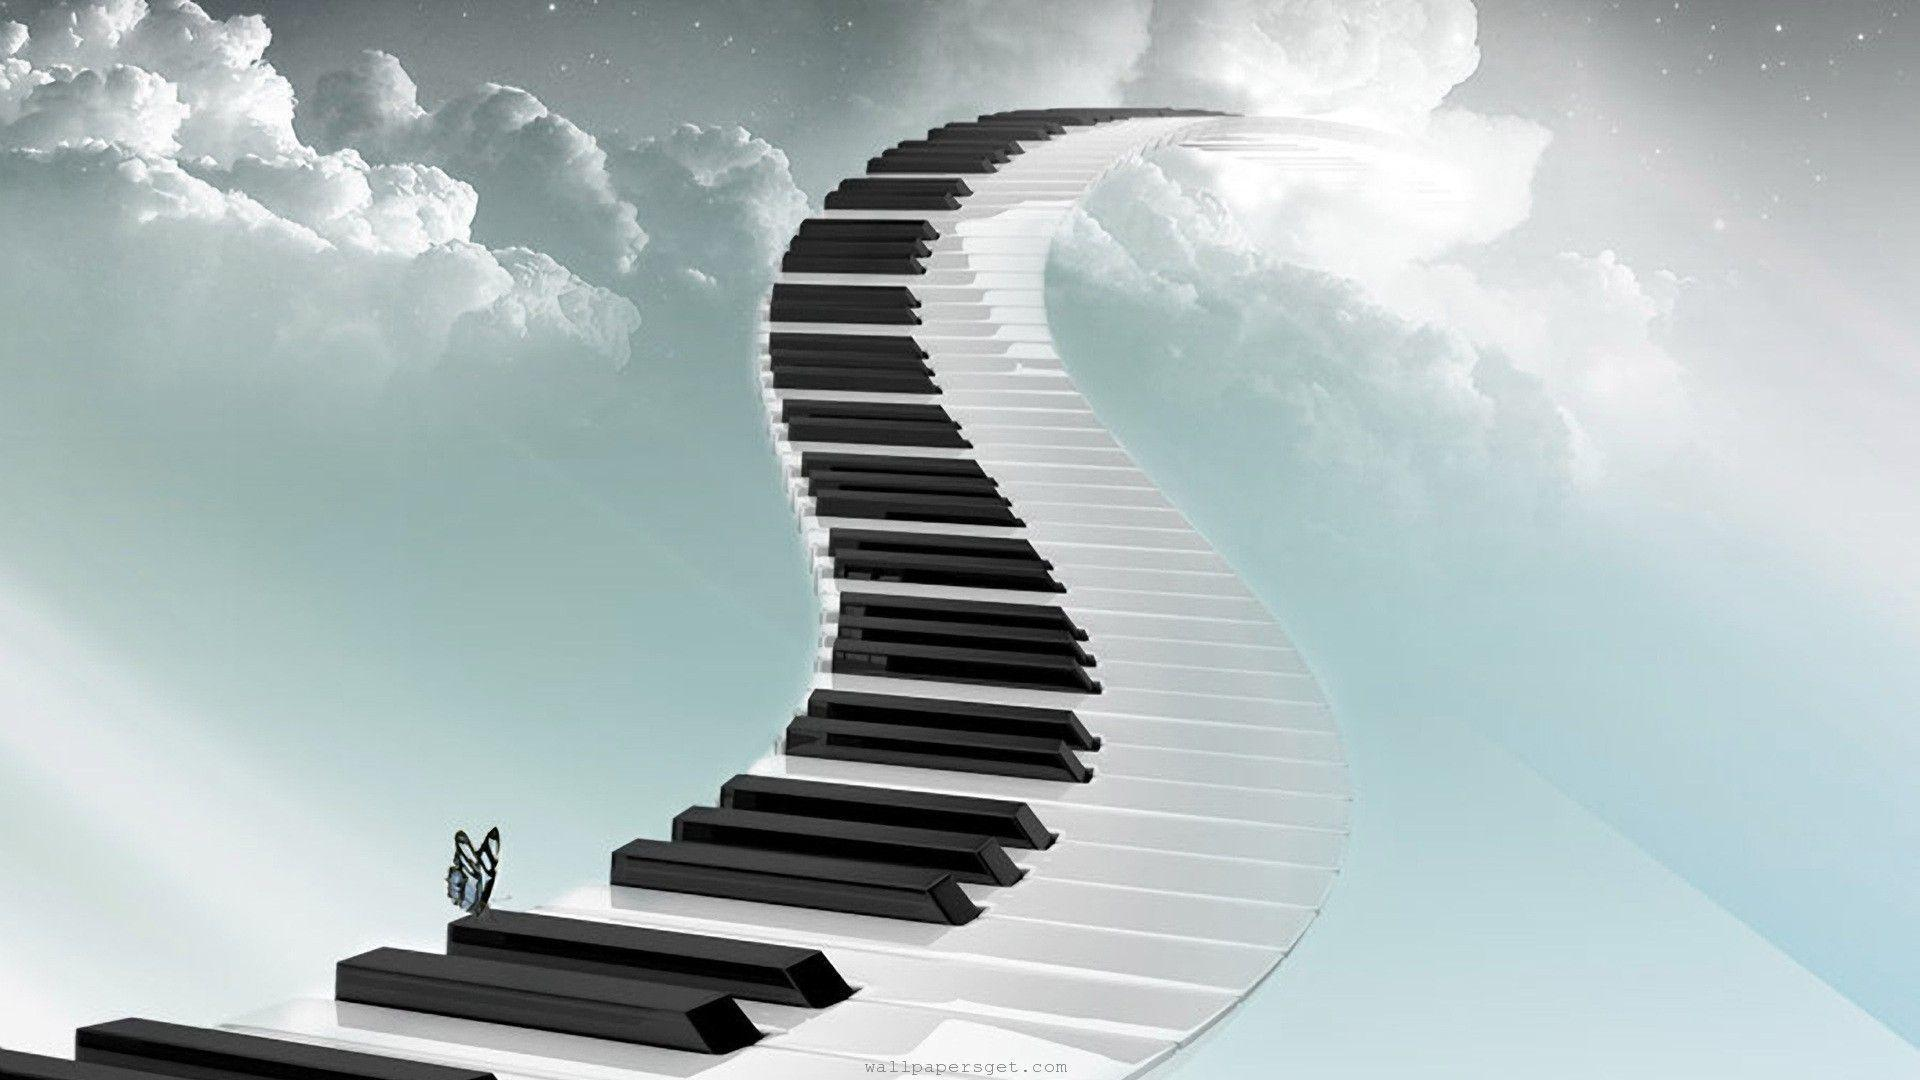 3d Jazz Music Wallpapers: Music Keyboard Wallpapers